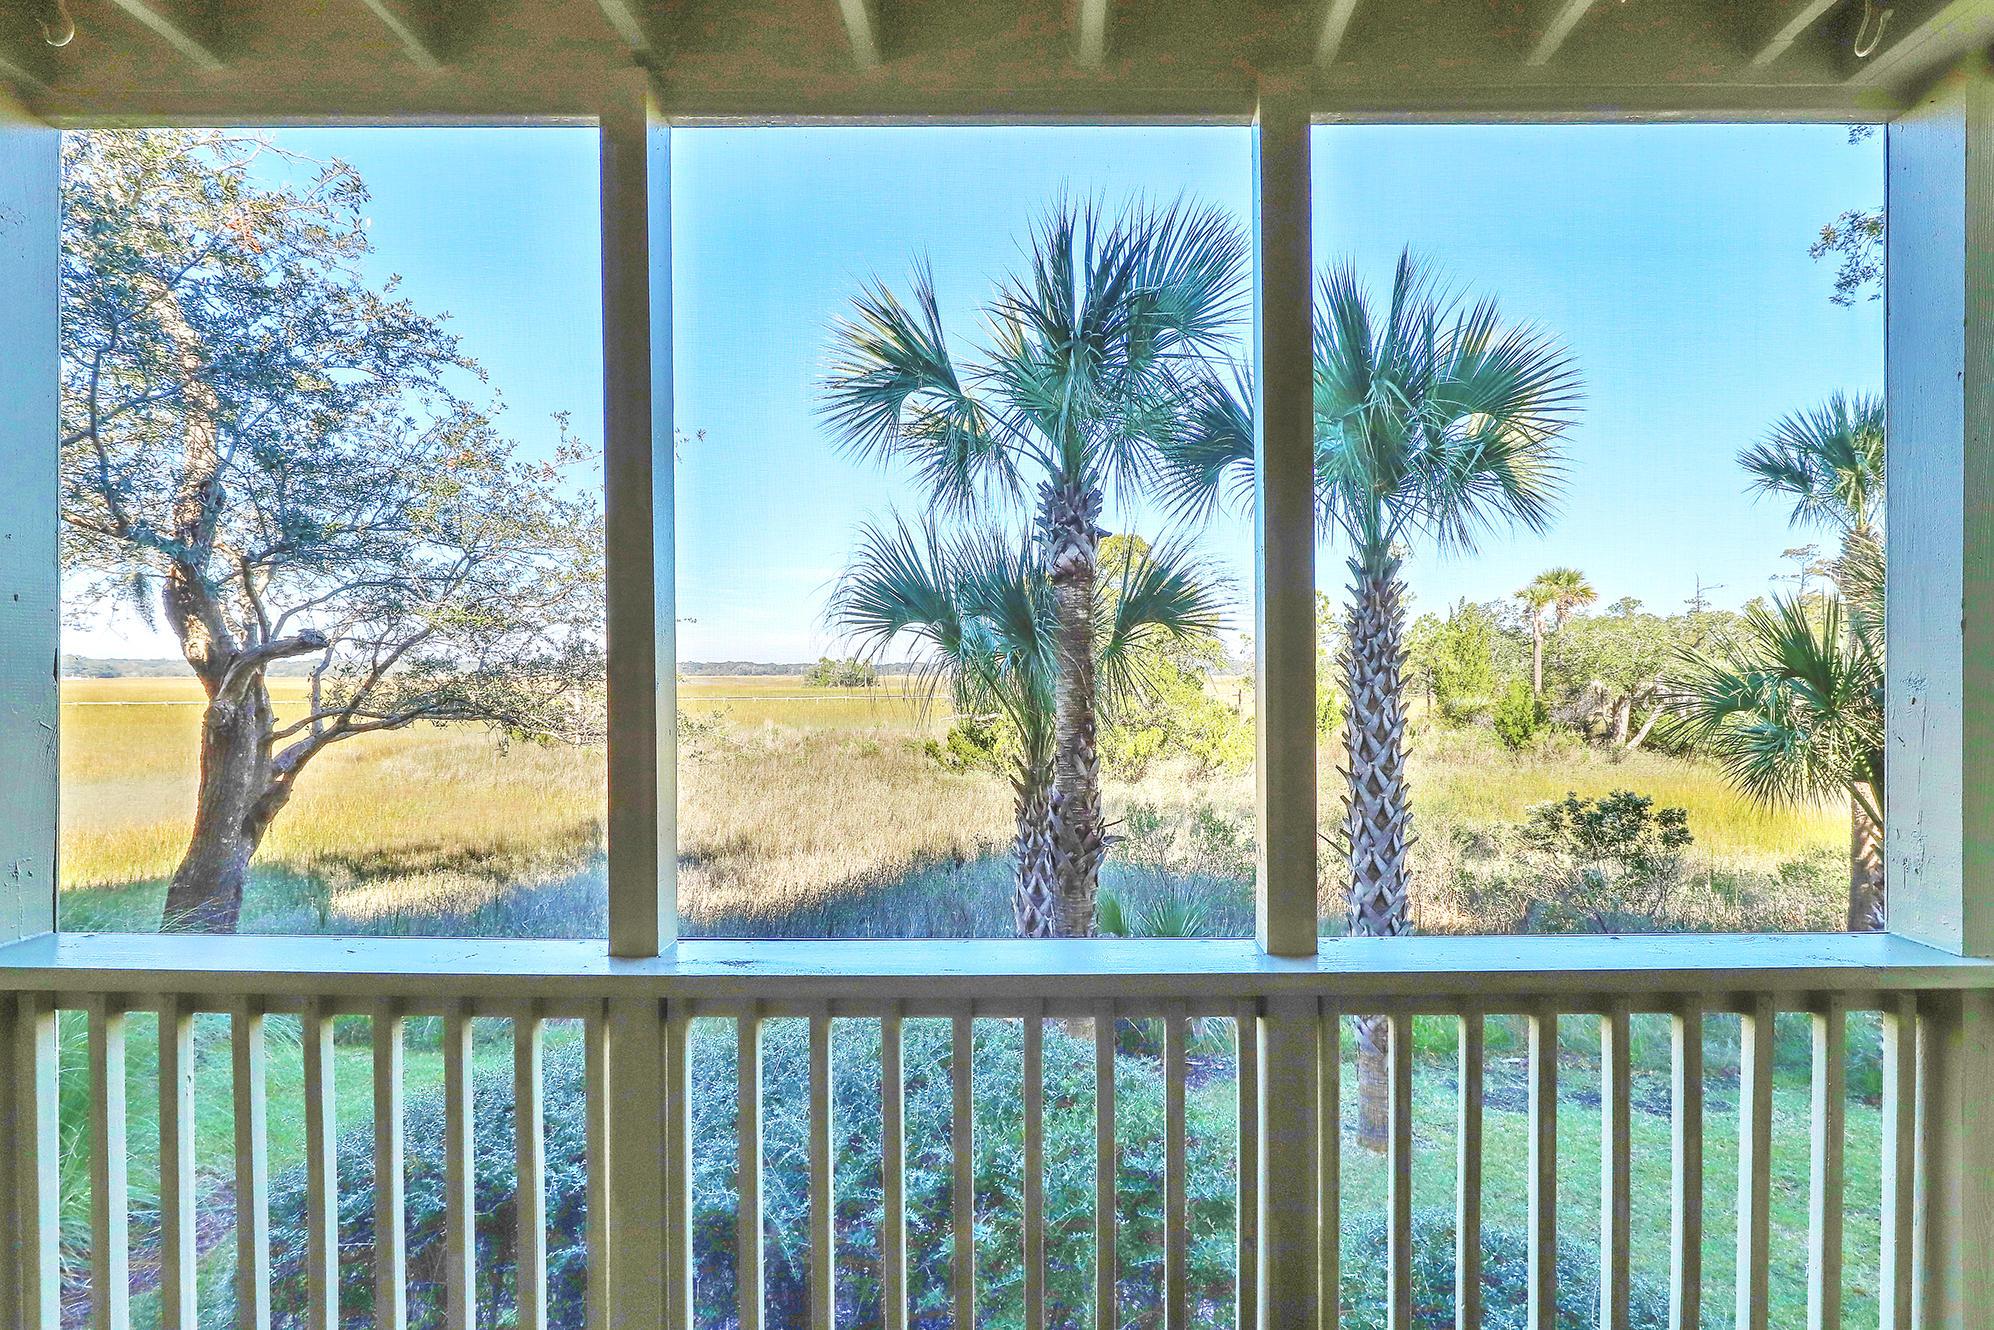 Seabrook Island Homes For Sale - 2103 Landfall, Johns Island, SC - 5